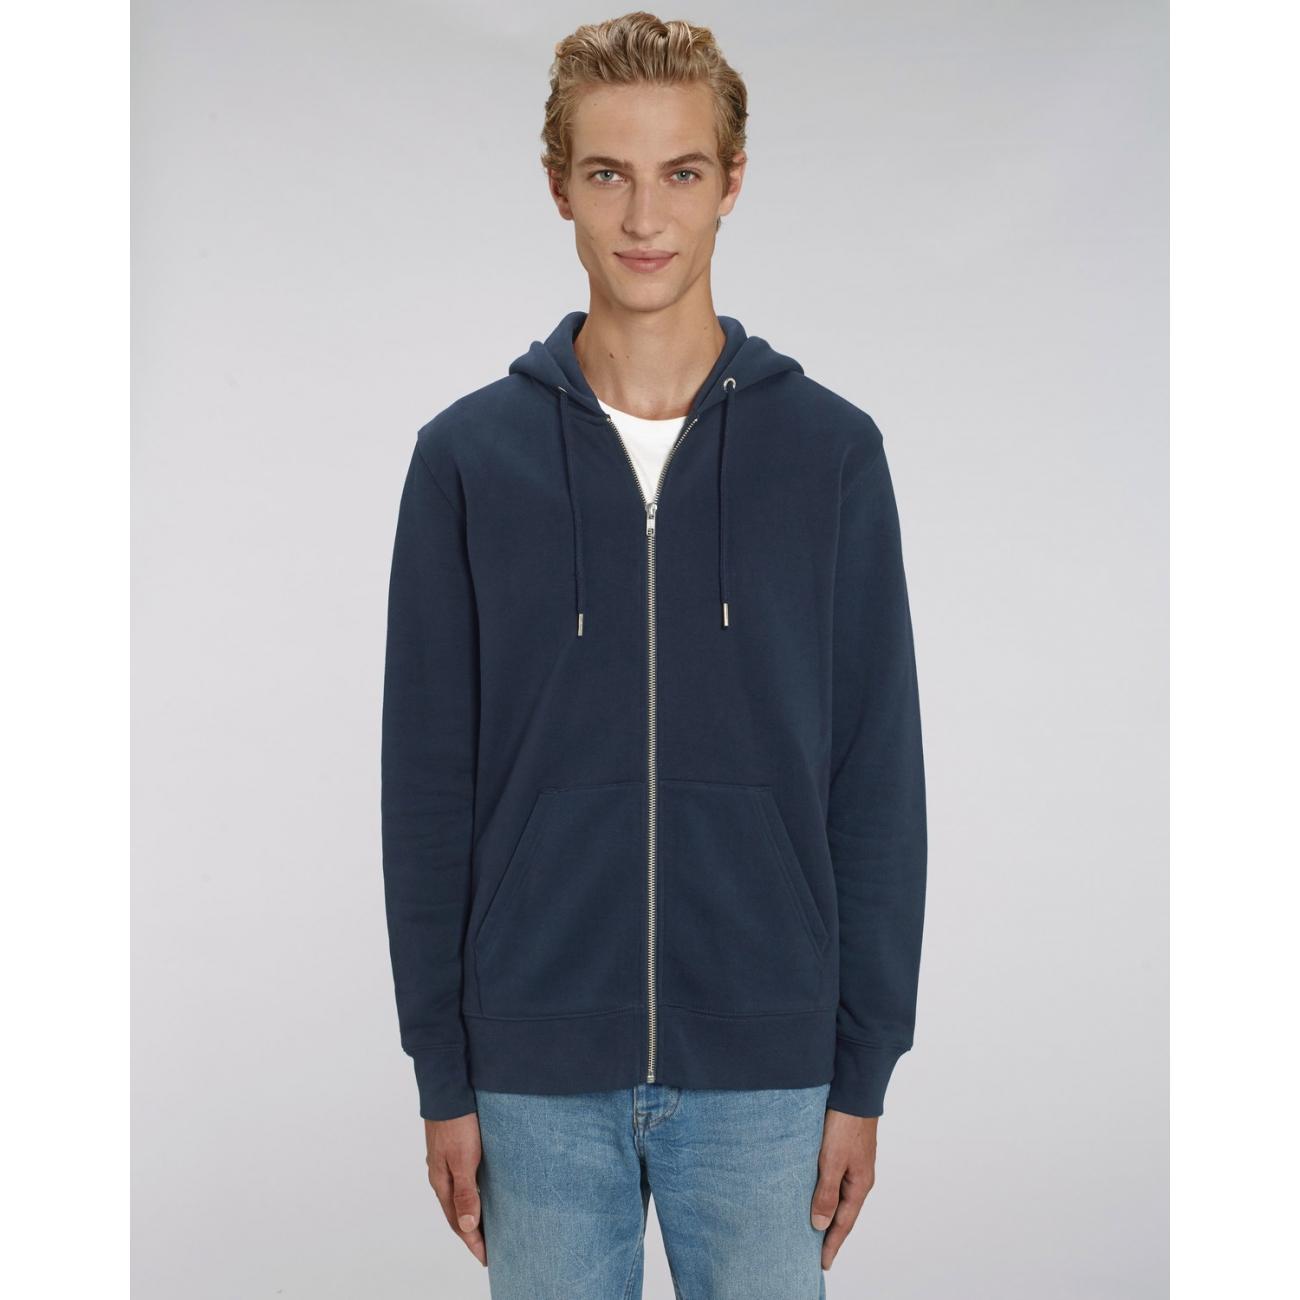 https://tee-shirt-bio.com/7453-thickbox_default/veste-capuche-zippee-homme-coton-bio-bleu-marine-fonce-cultivator.jpg